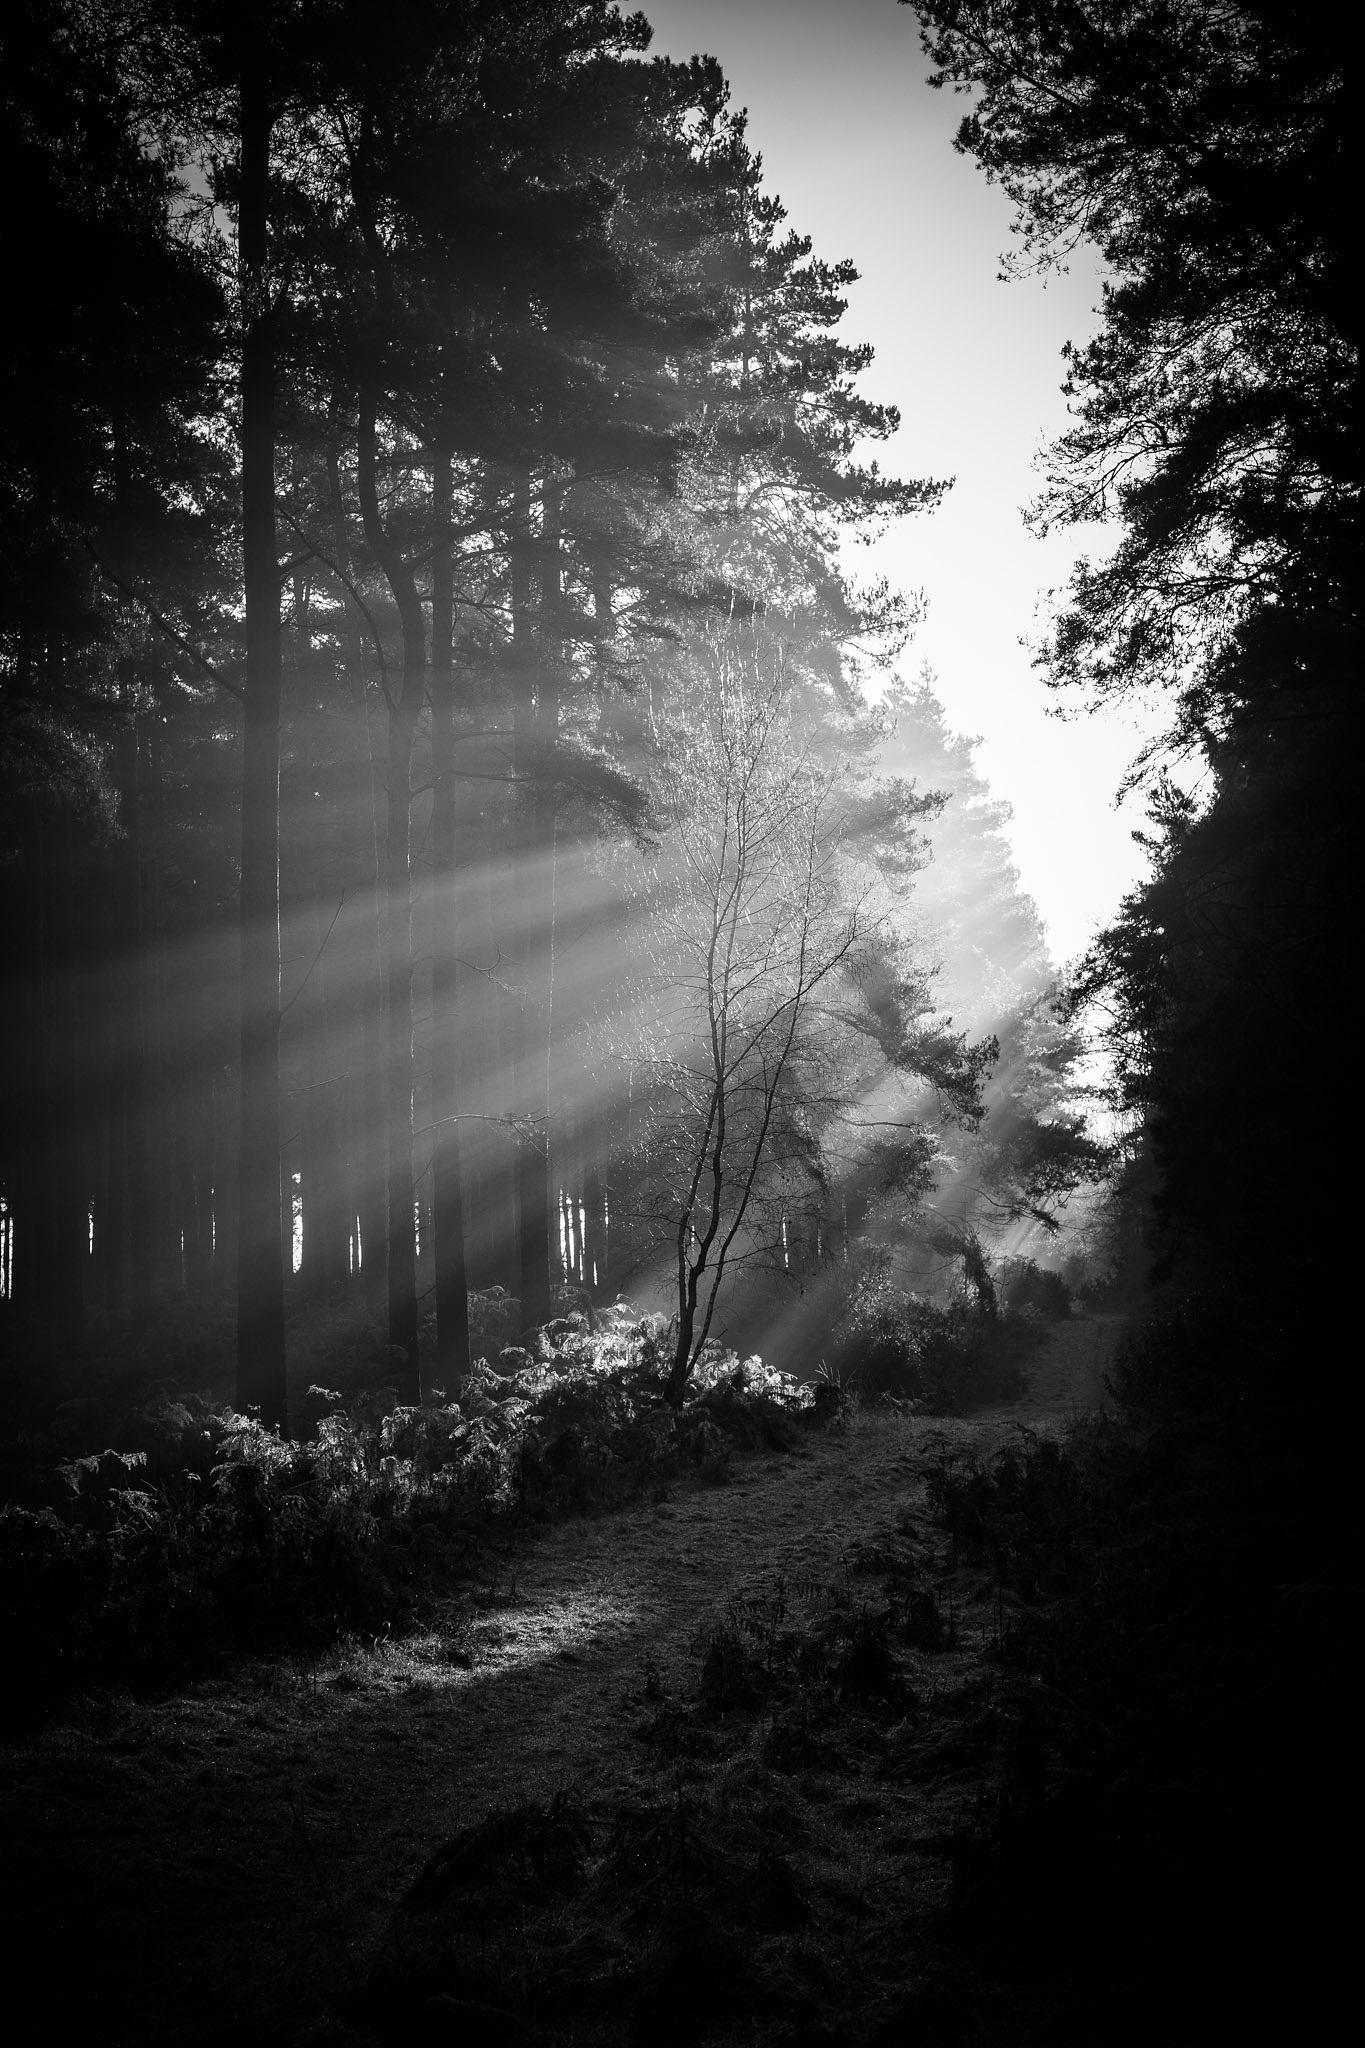 The enlightened path by WellsyJay